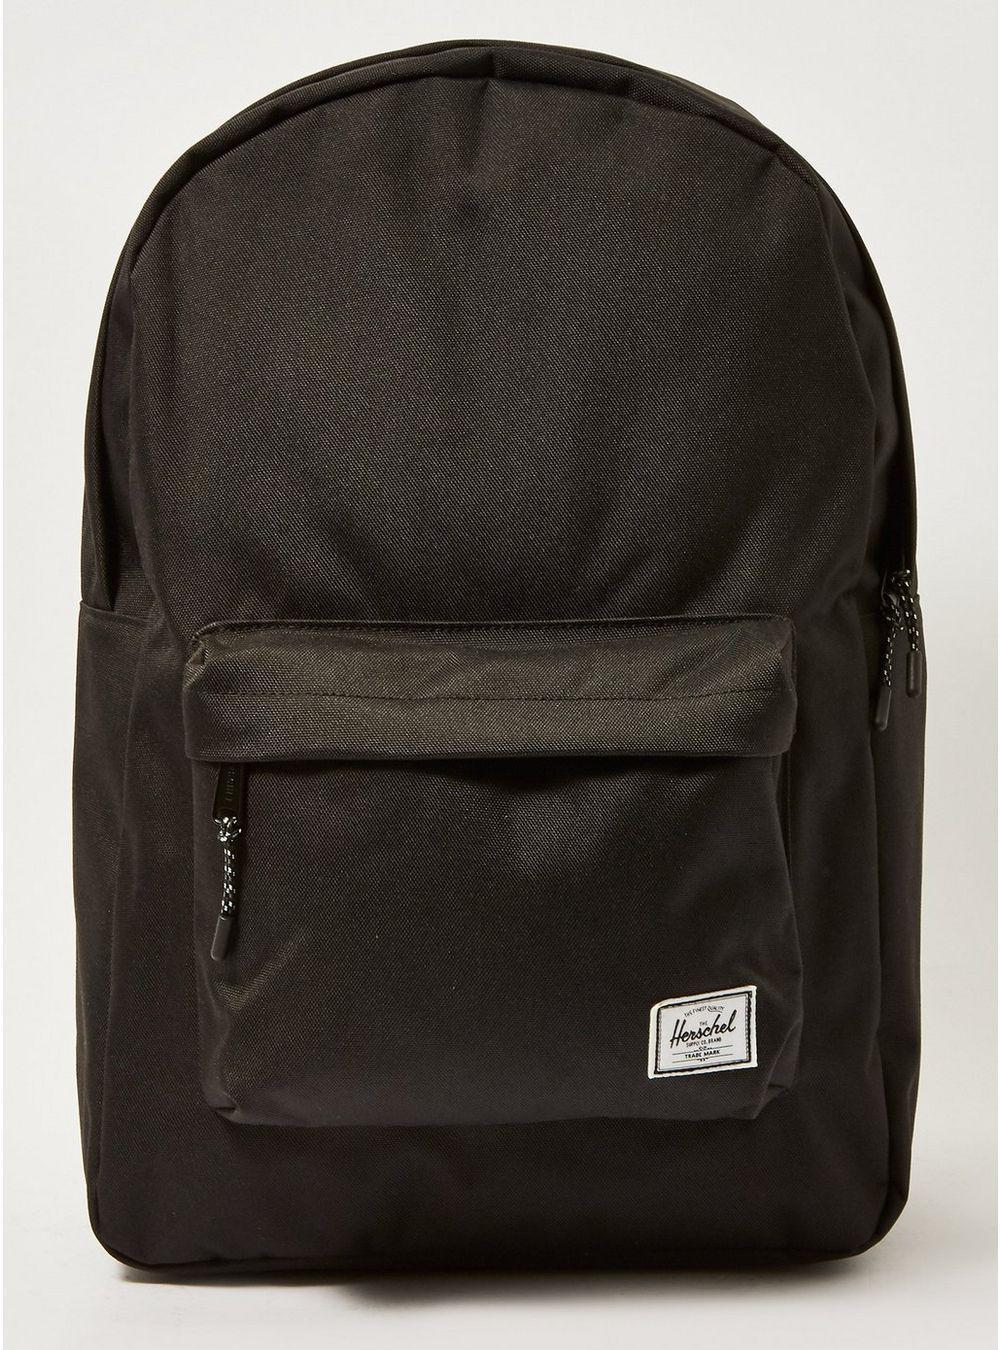 bf5774baaa92 Herschel Supply Co. Classic Black Backpack in Black for Men - Lyst